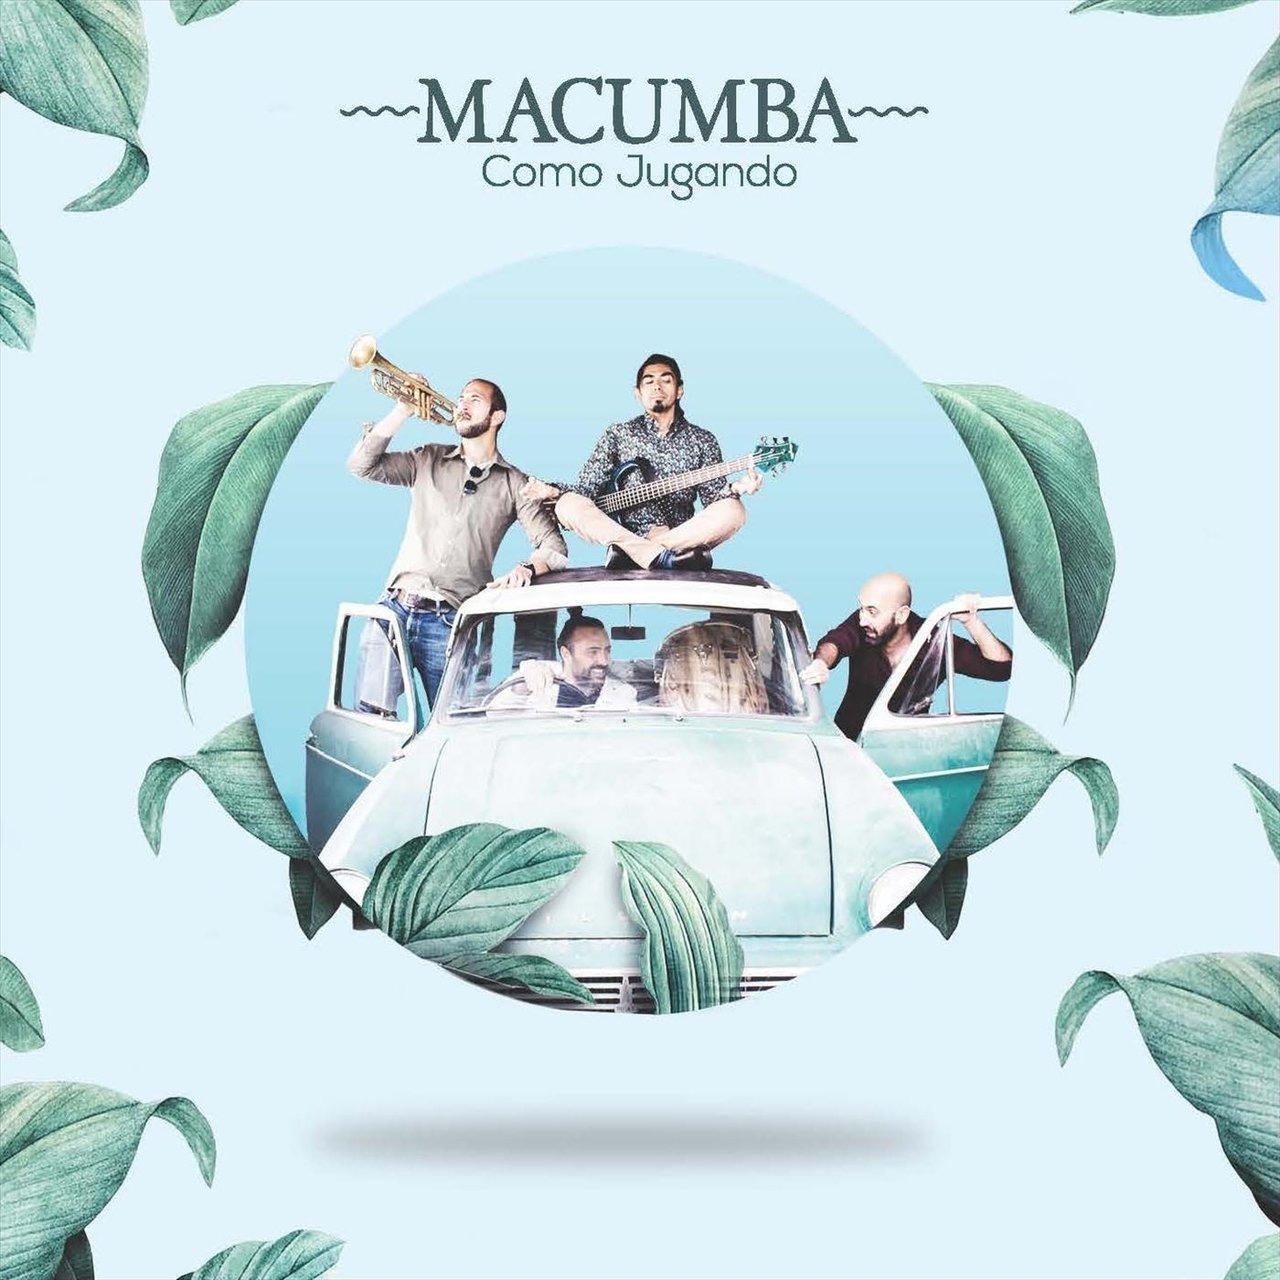 Mombassa - Macumba (Chipre) feat. Alberto Caicedo